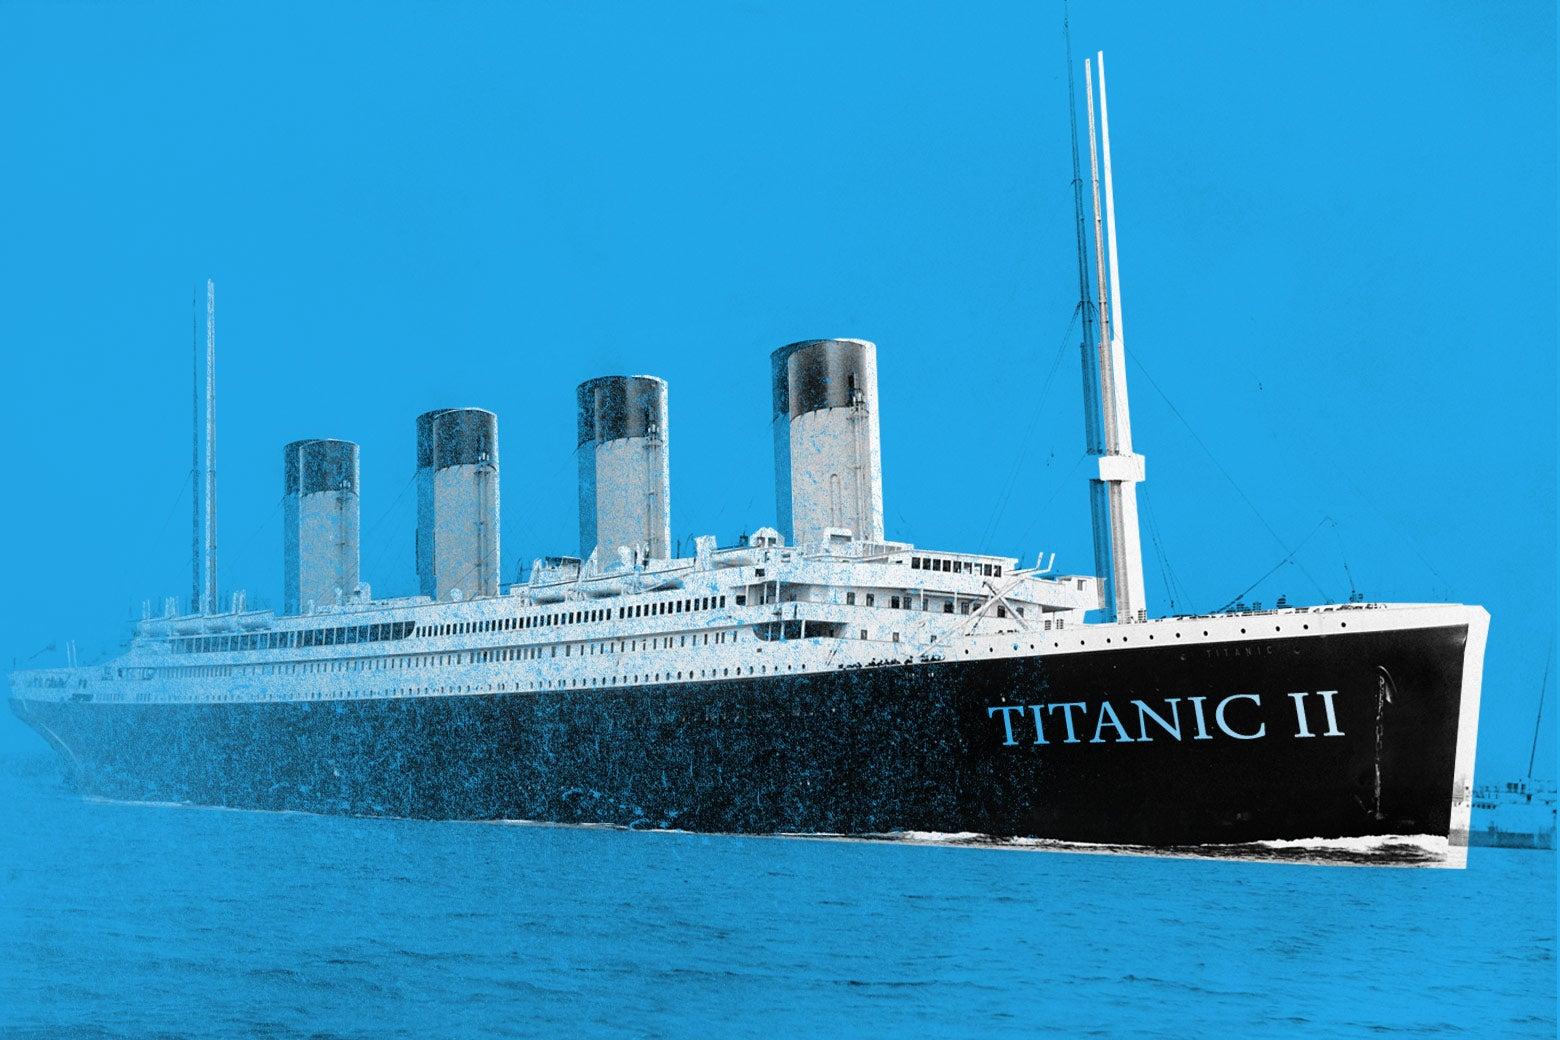 The Titanic II, fading away like a dream.